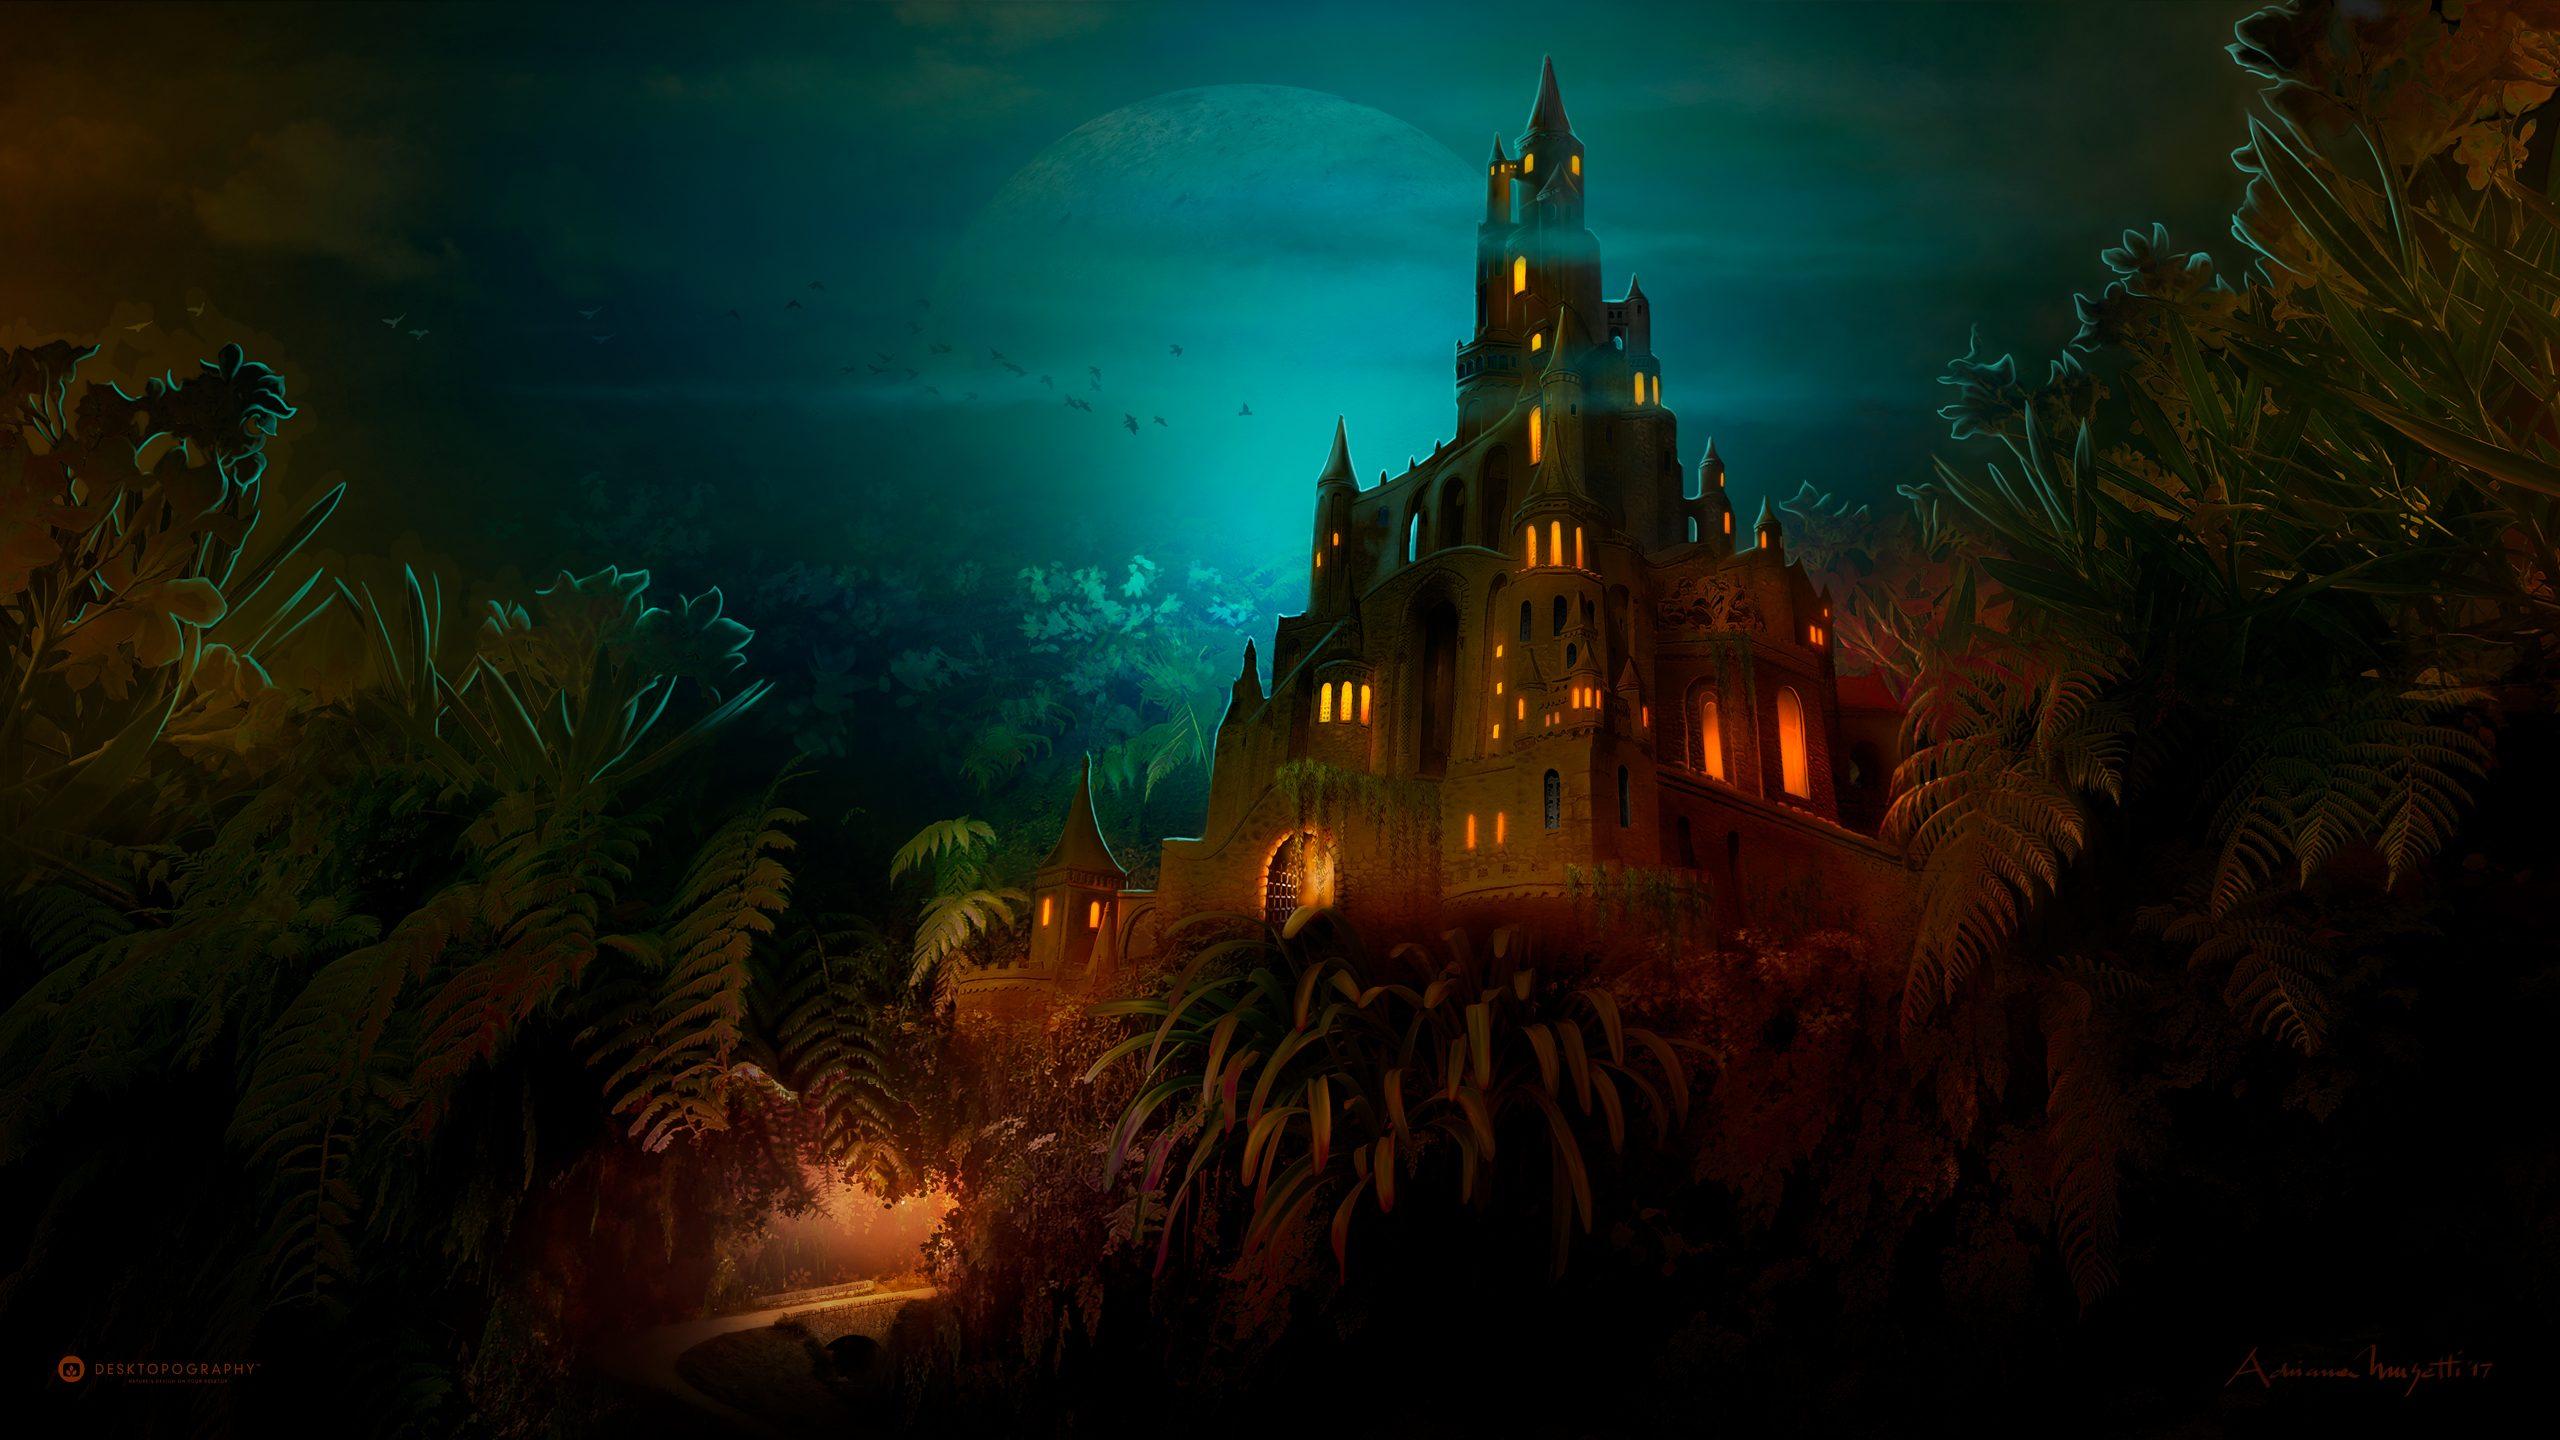 Wallpaper Dino Cute Lilliput Castle Dark Night Wallpapers Hd Wallpapers Id